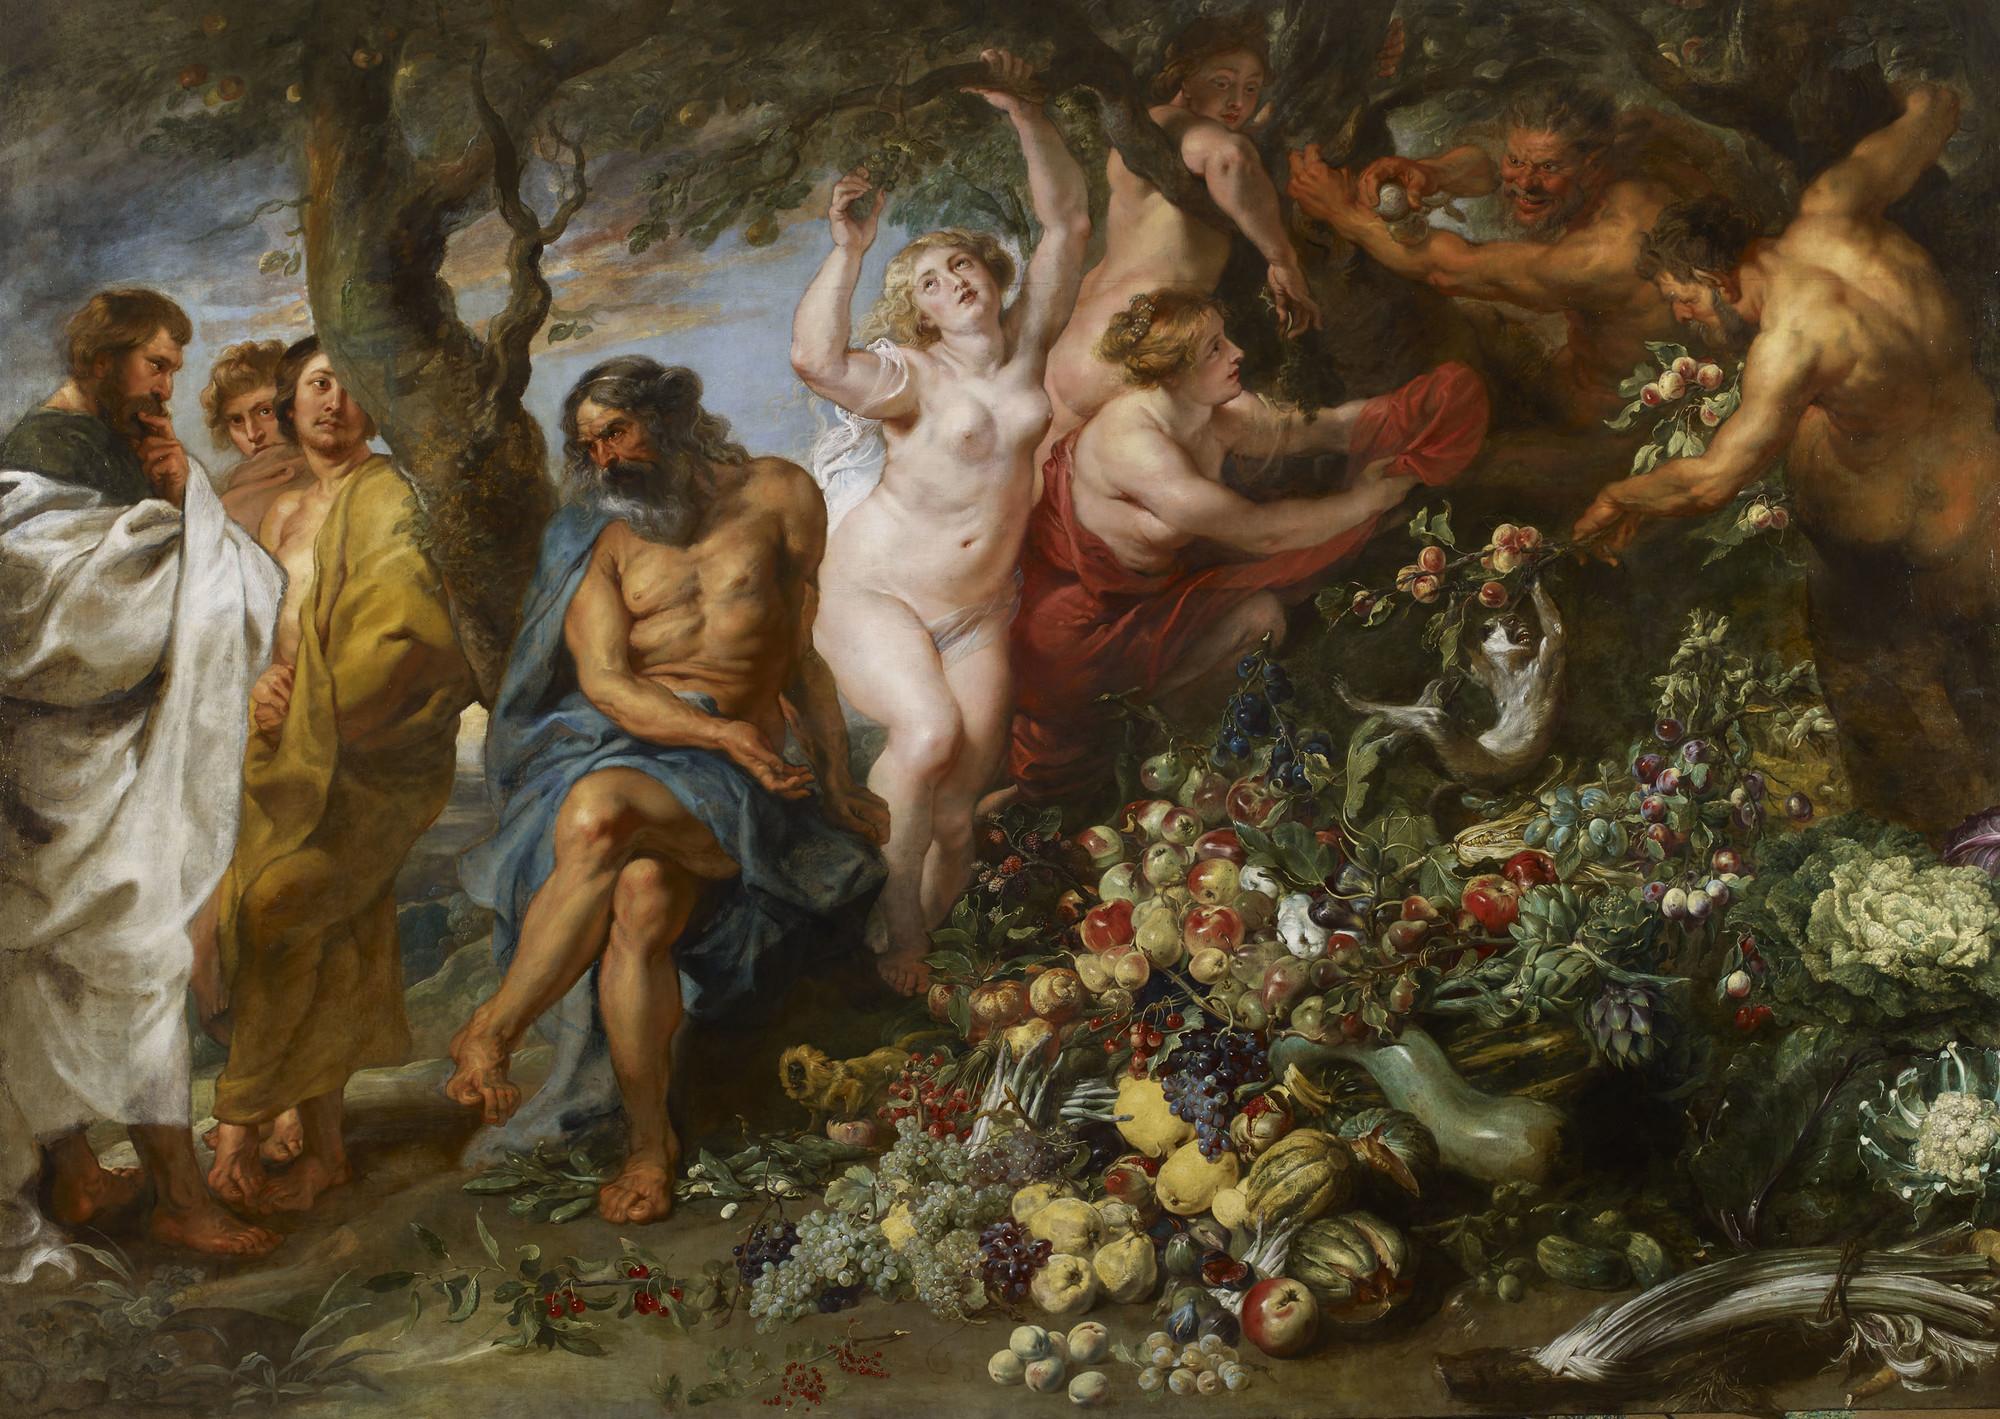 Rubens and Snyder Pythagoras advocating vegetarianism, owoce, dieta, wegetarianizm